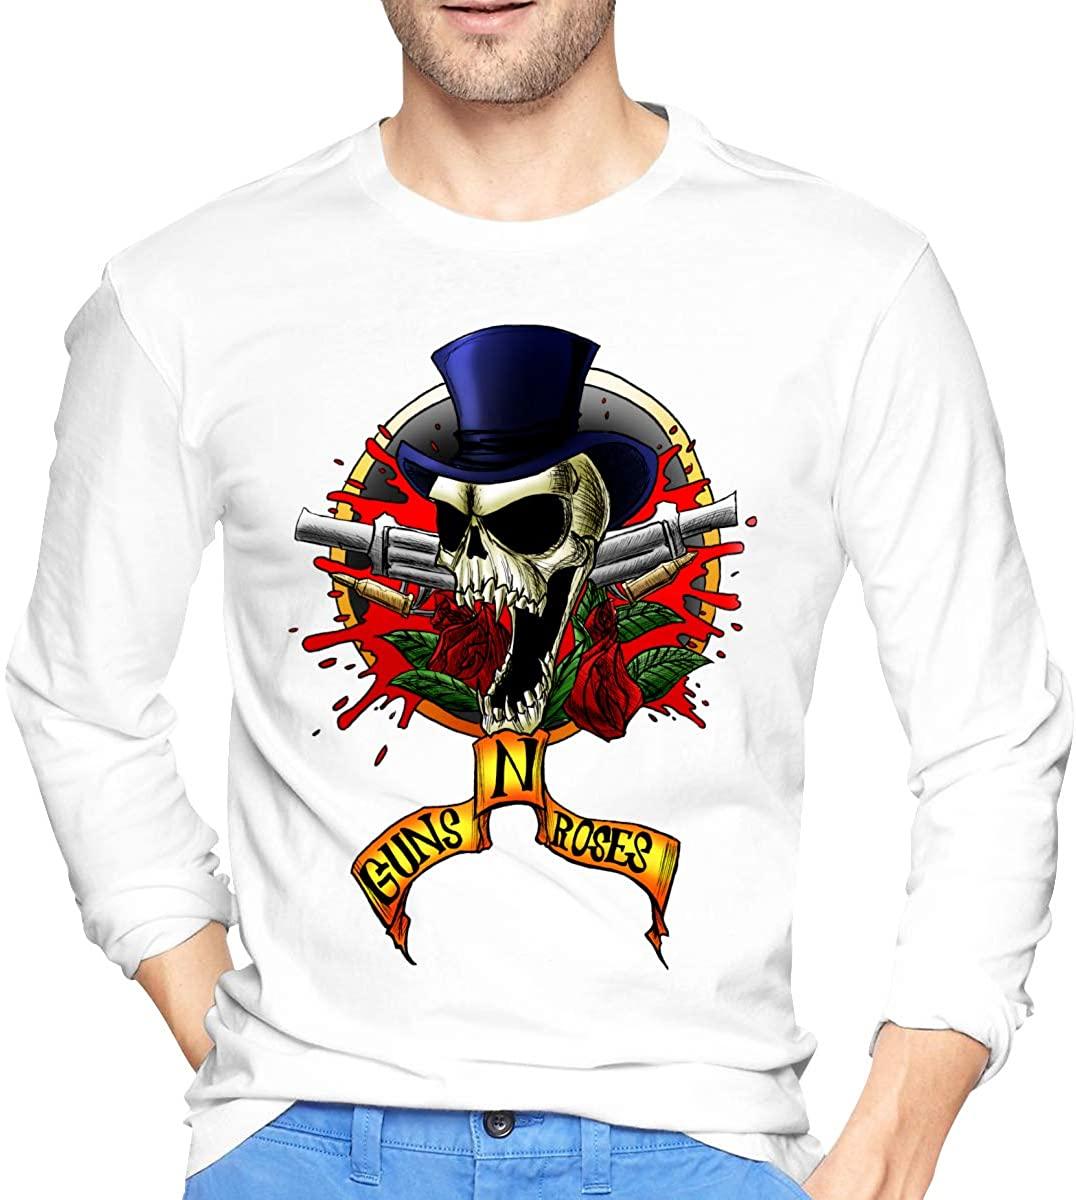 G-U-N-S N R-Os-E Men's Long Sleeve T-Shirts White